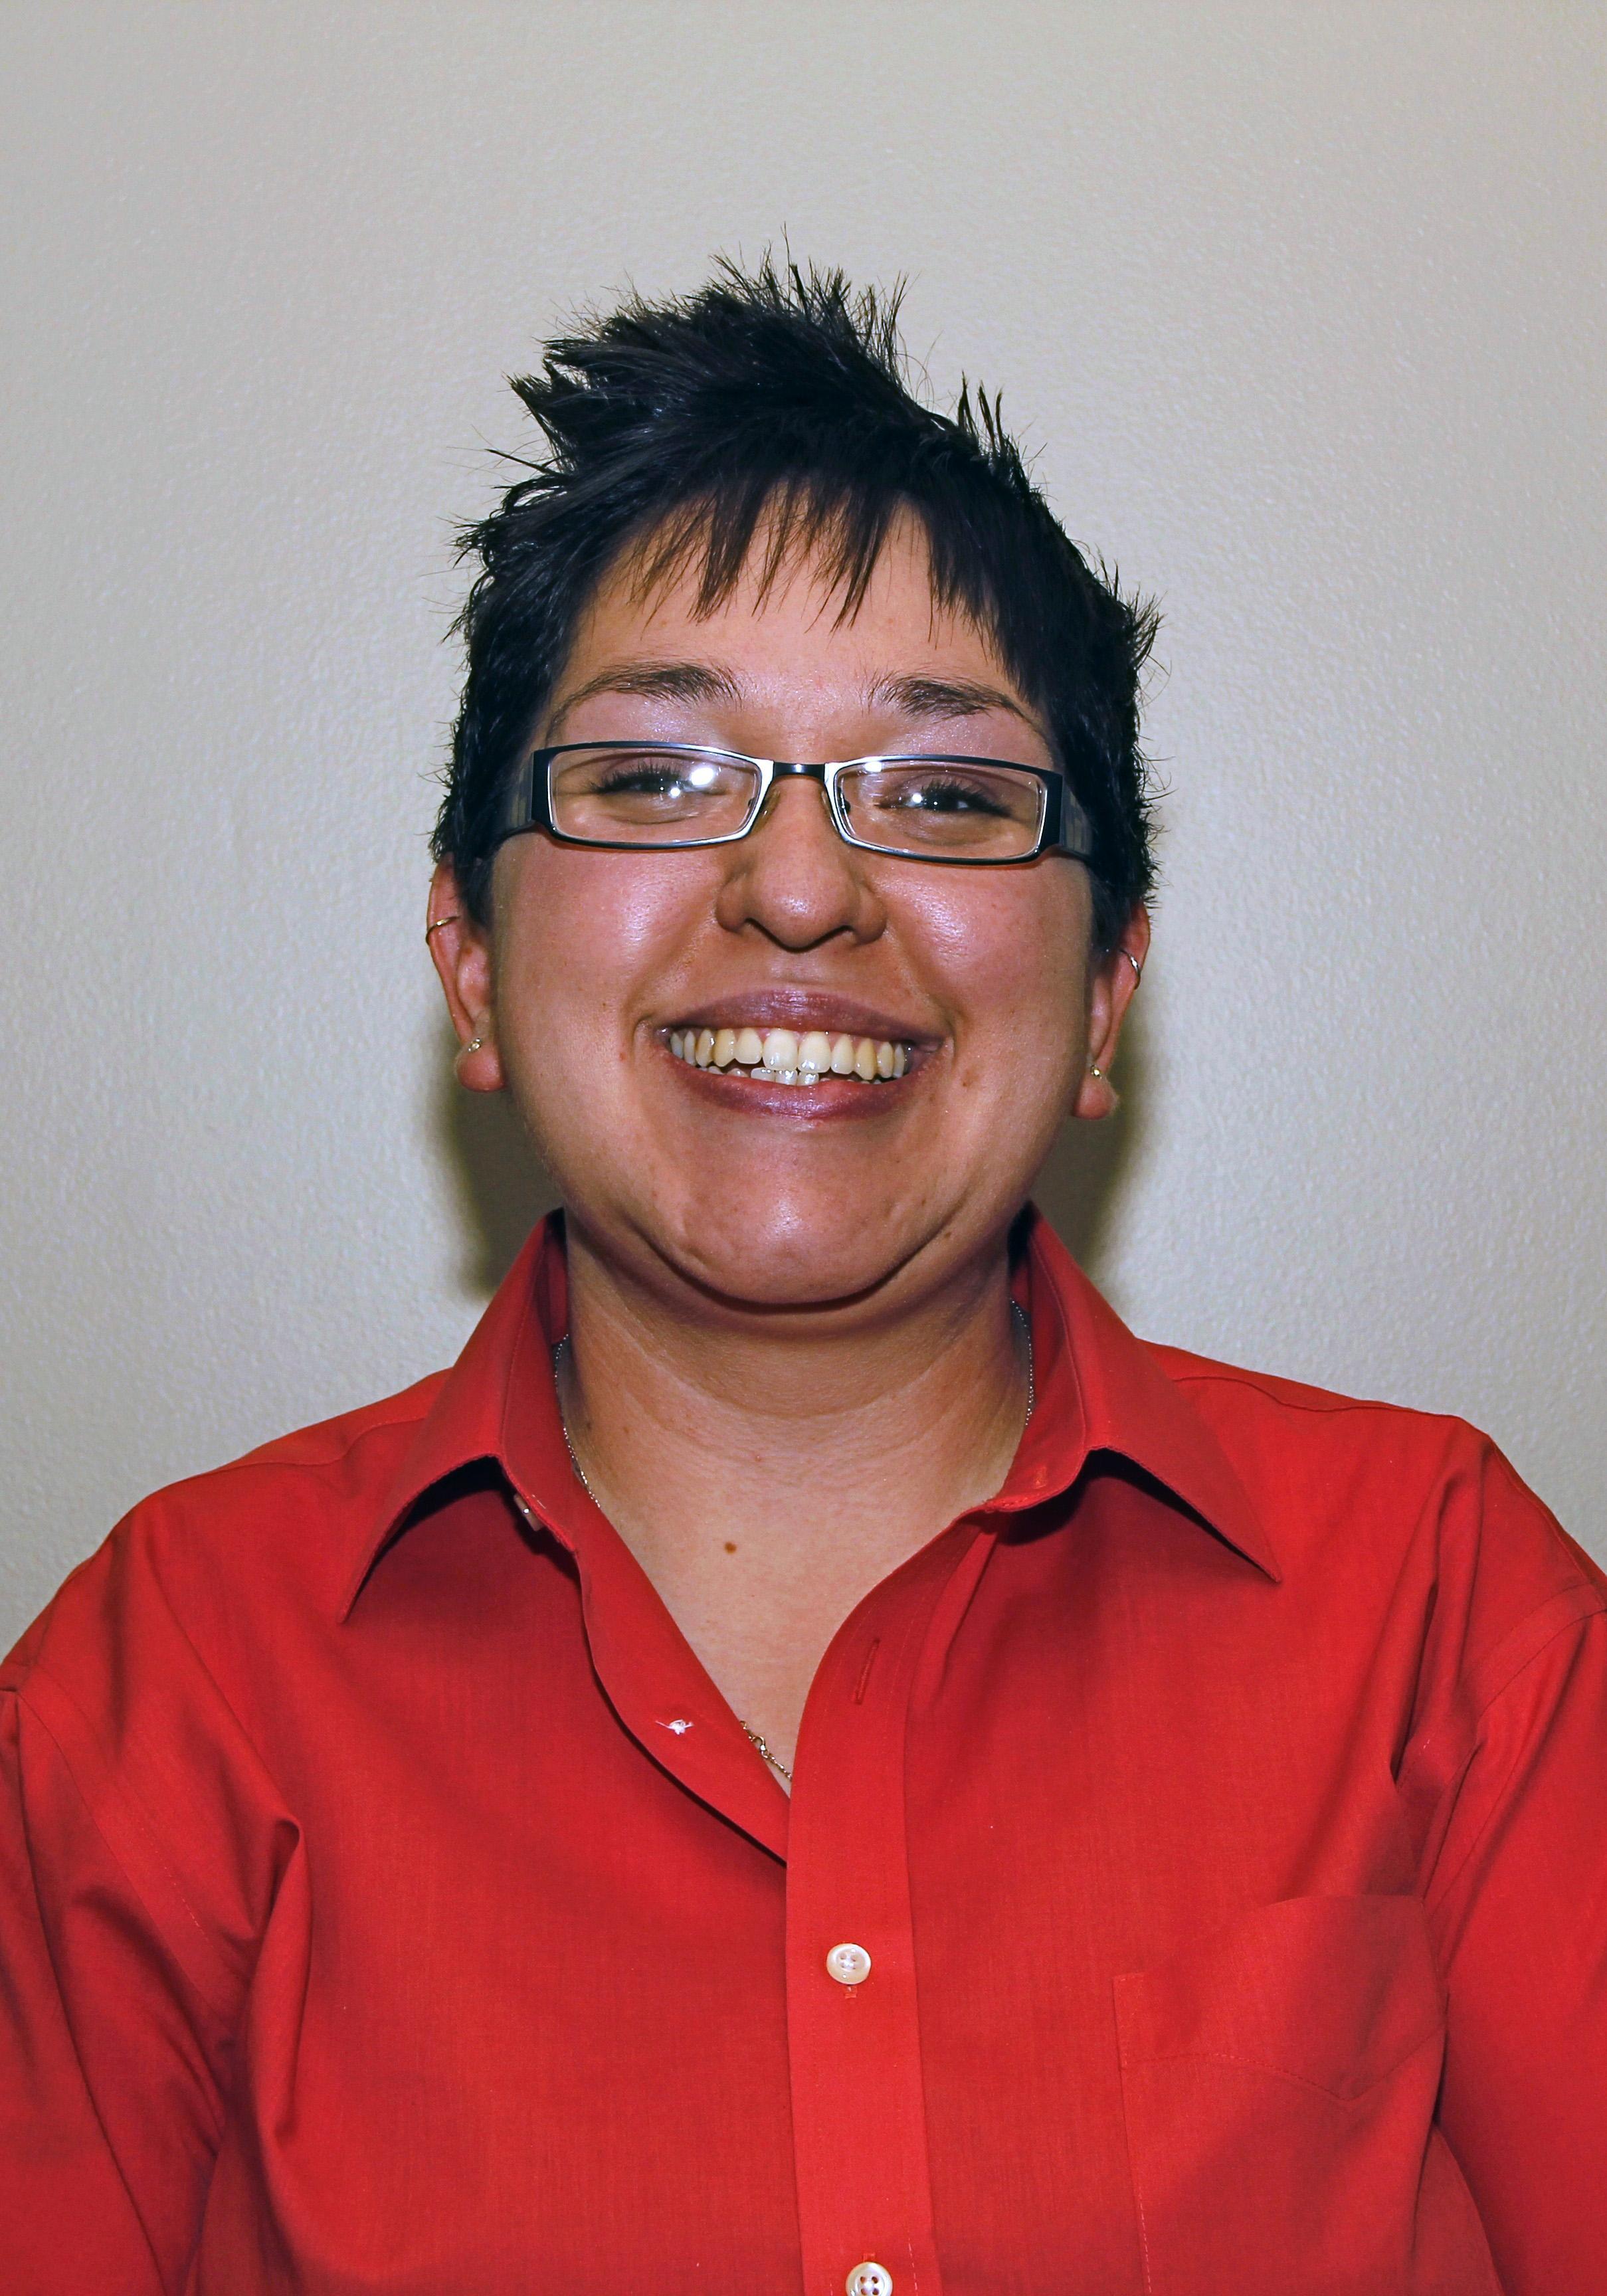 Portrait of Vanessa Delgado